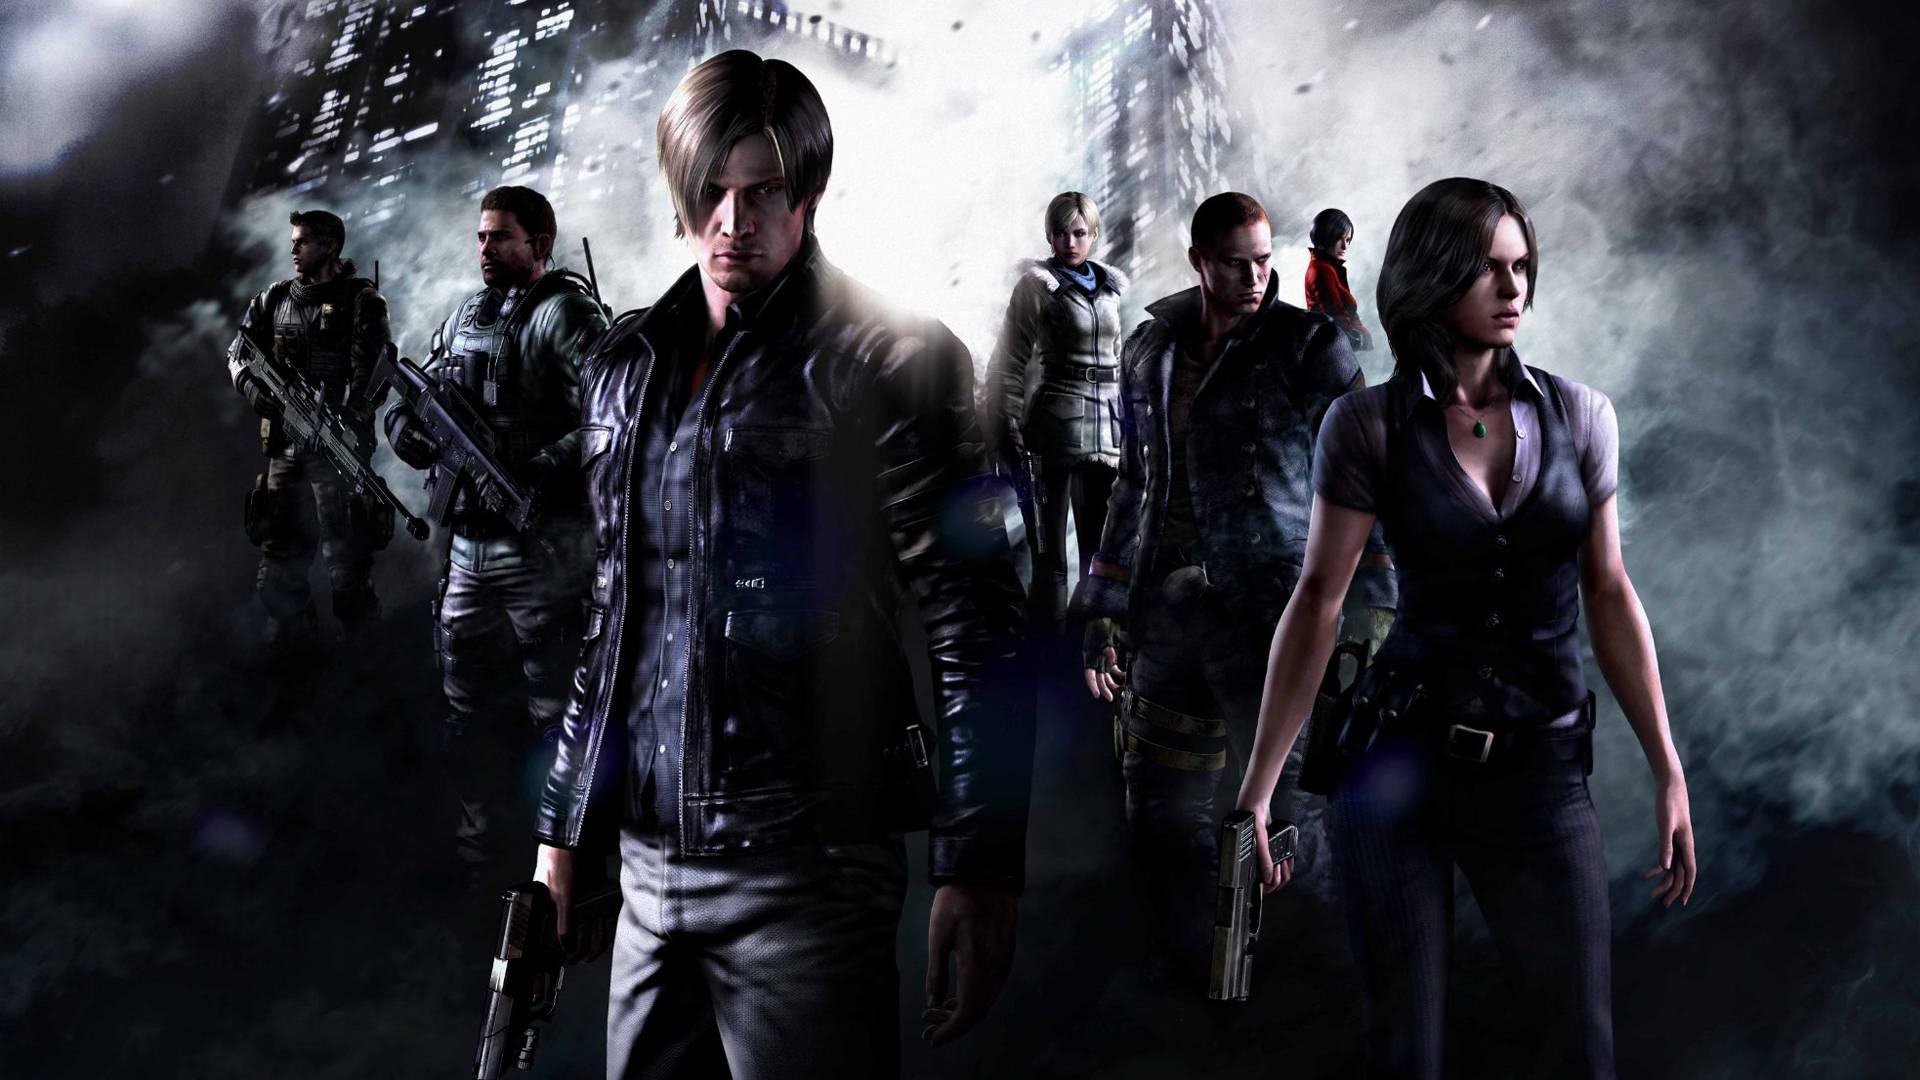 Video Game Wallpaper - Resident Evil 6 , HD Wallpaper & Backgrounds